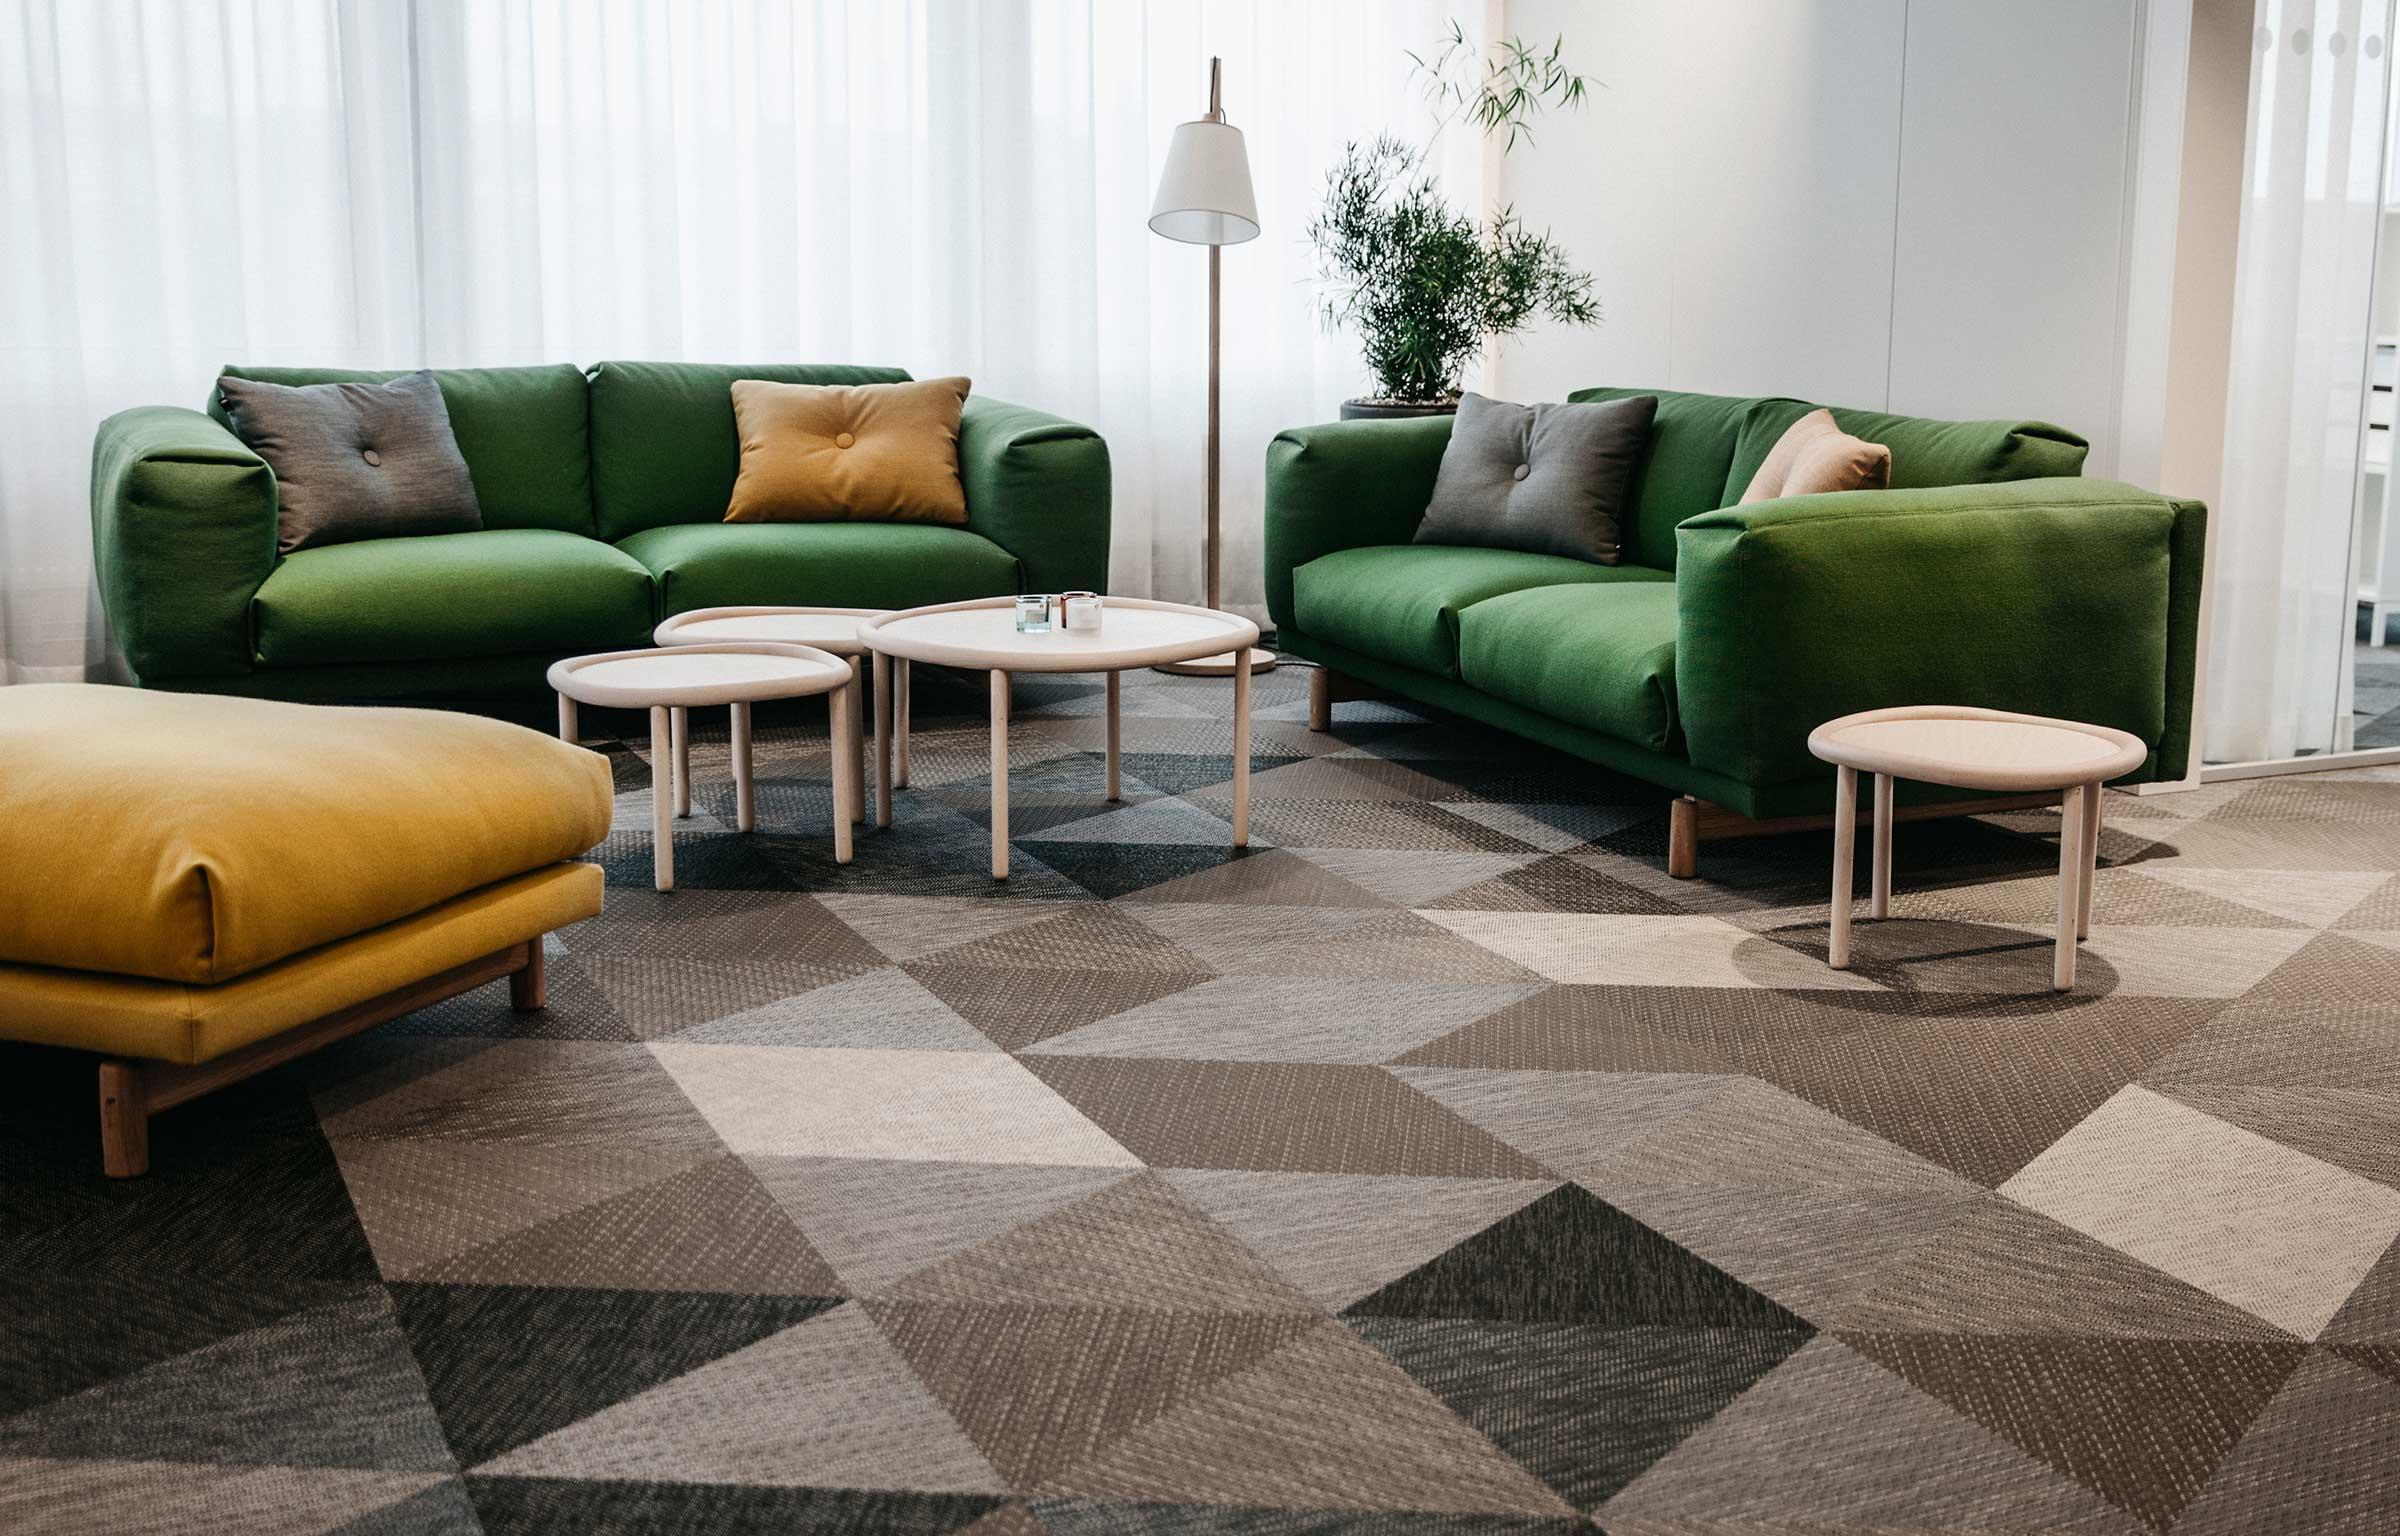 Bolon Studio Triangles in Glimstedt office in Park49, Gothenburg